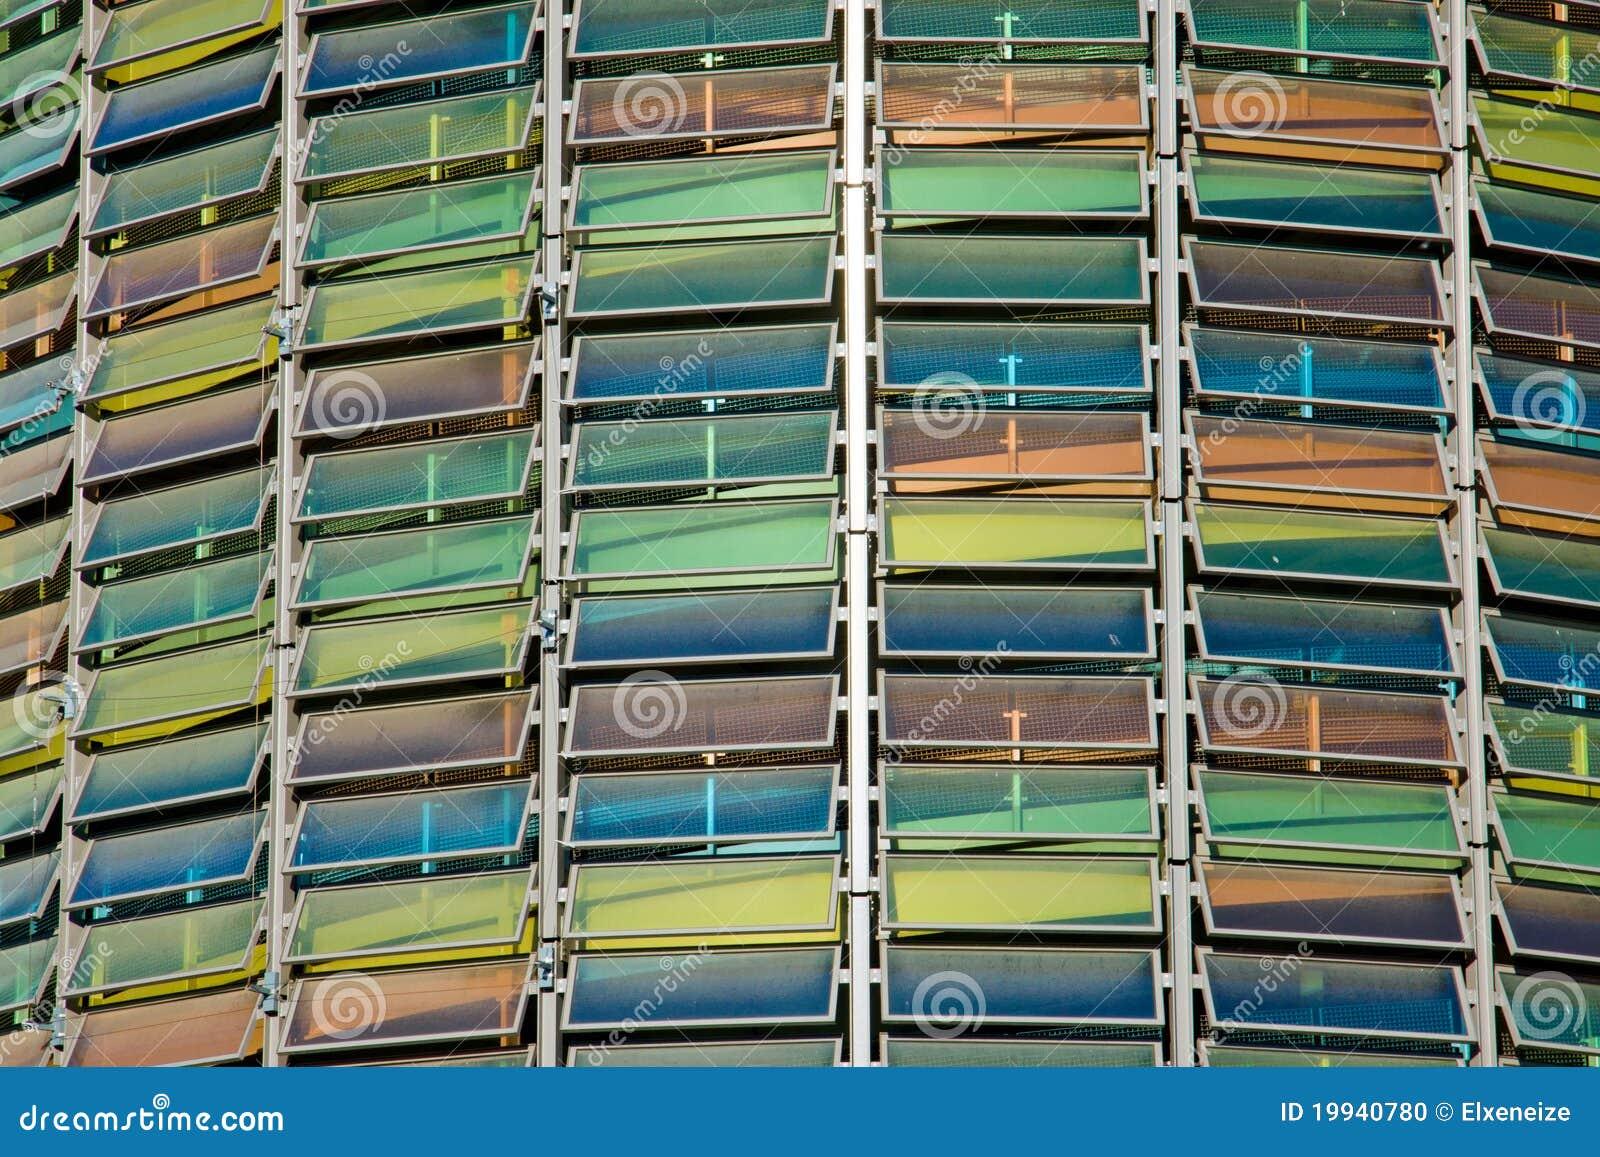 Glasfassade bunt  Bunte Glasfassade Stockfoto - Bild: 19940780